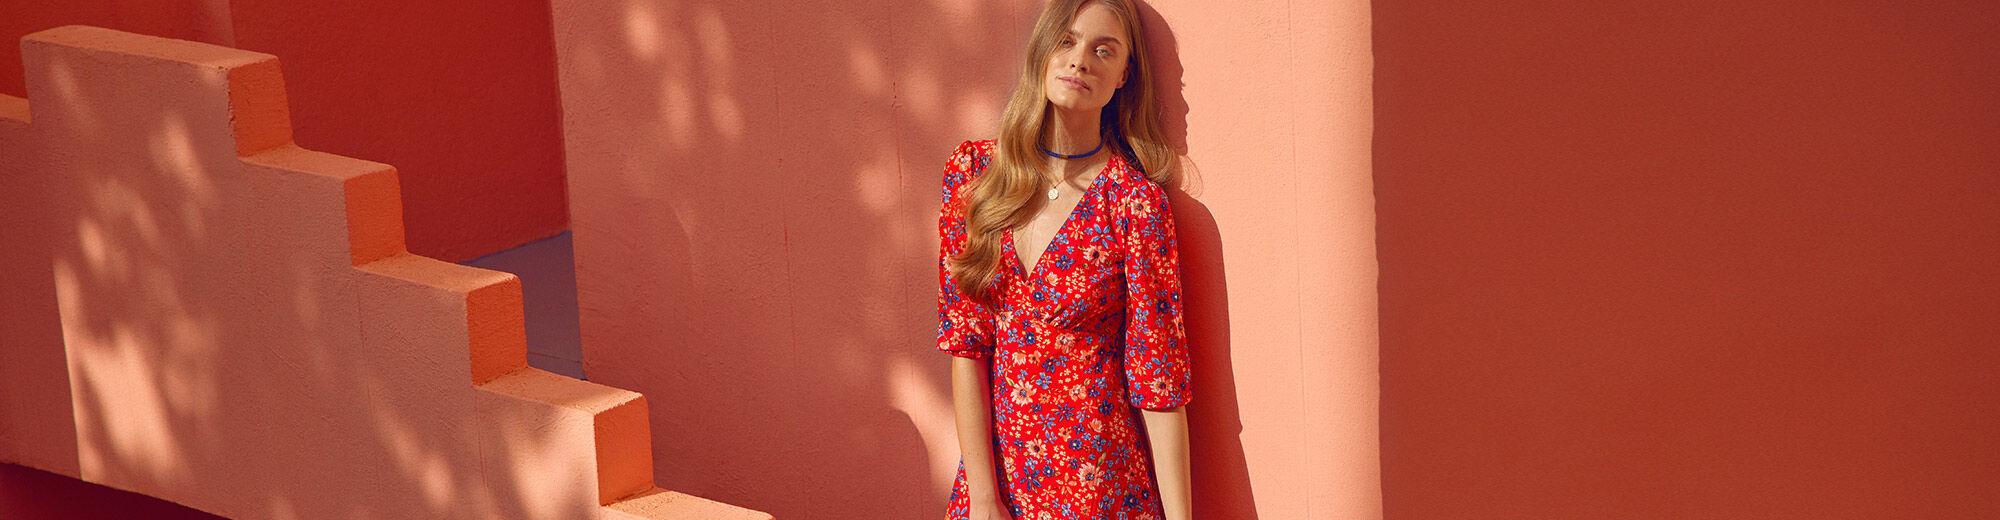 Endless summer, Endless dresses